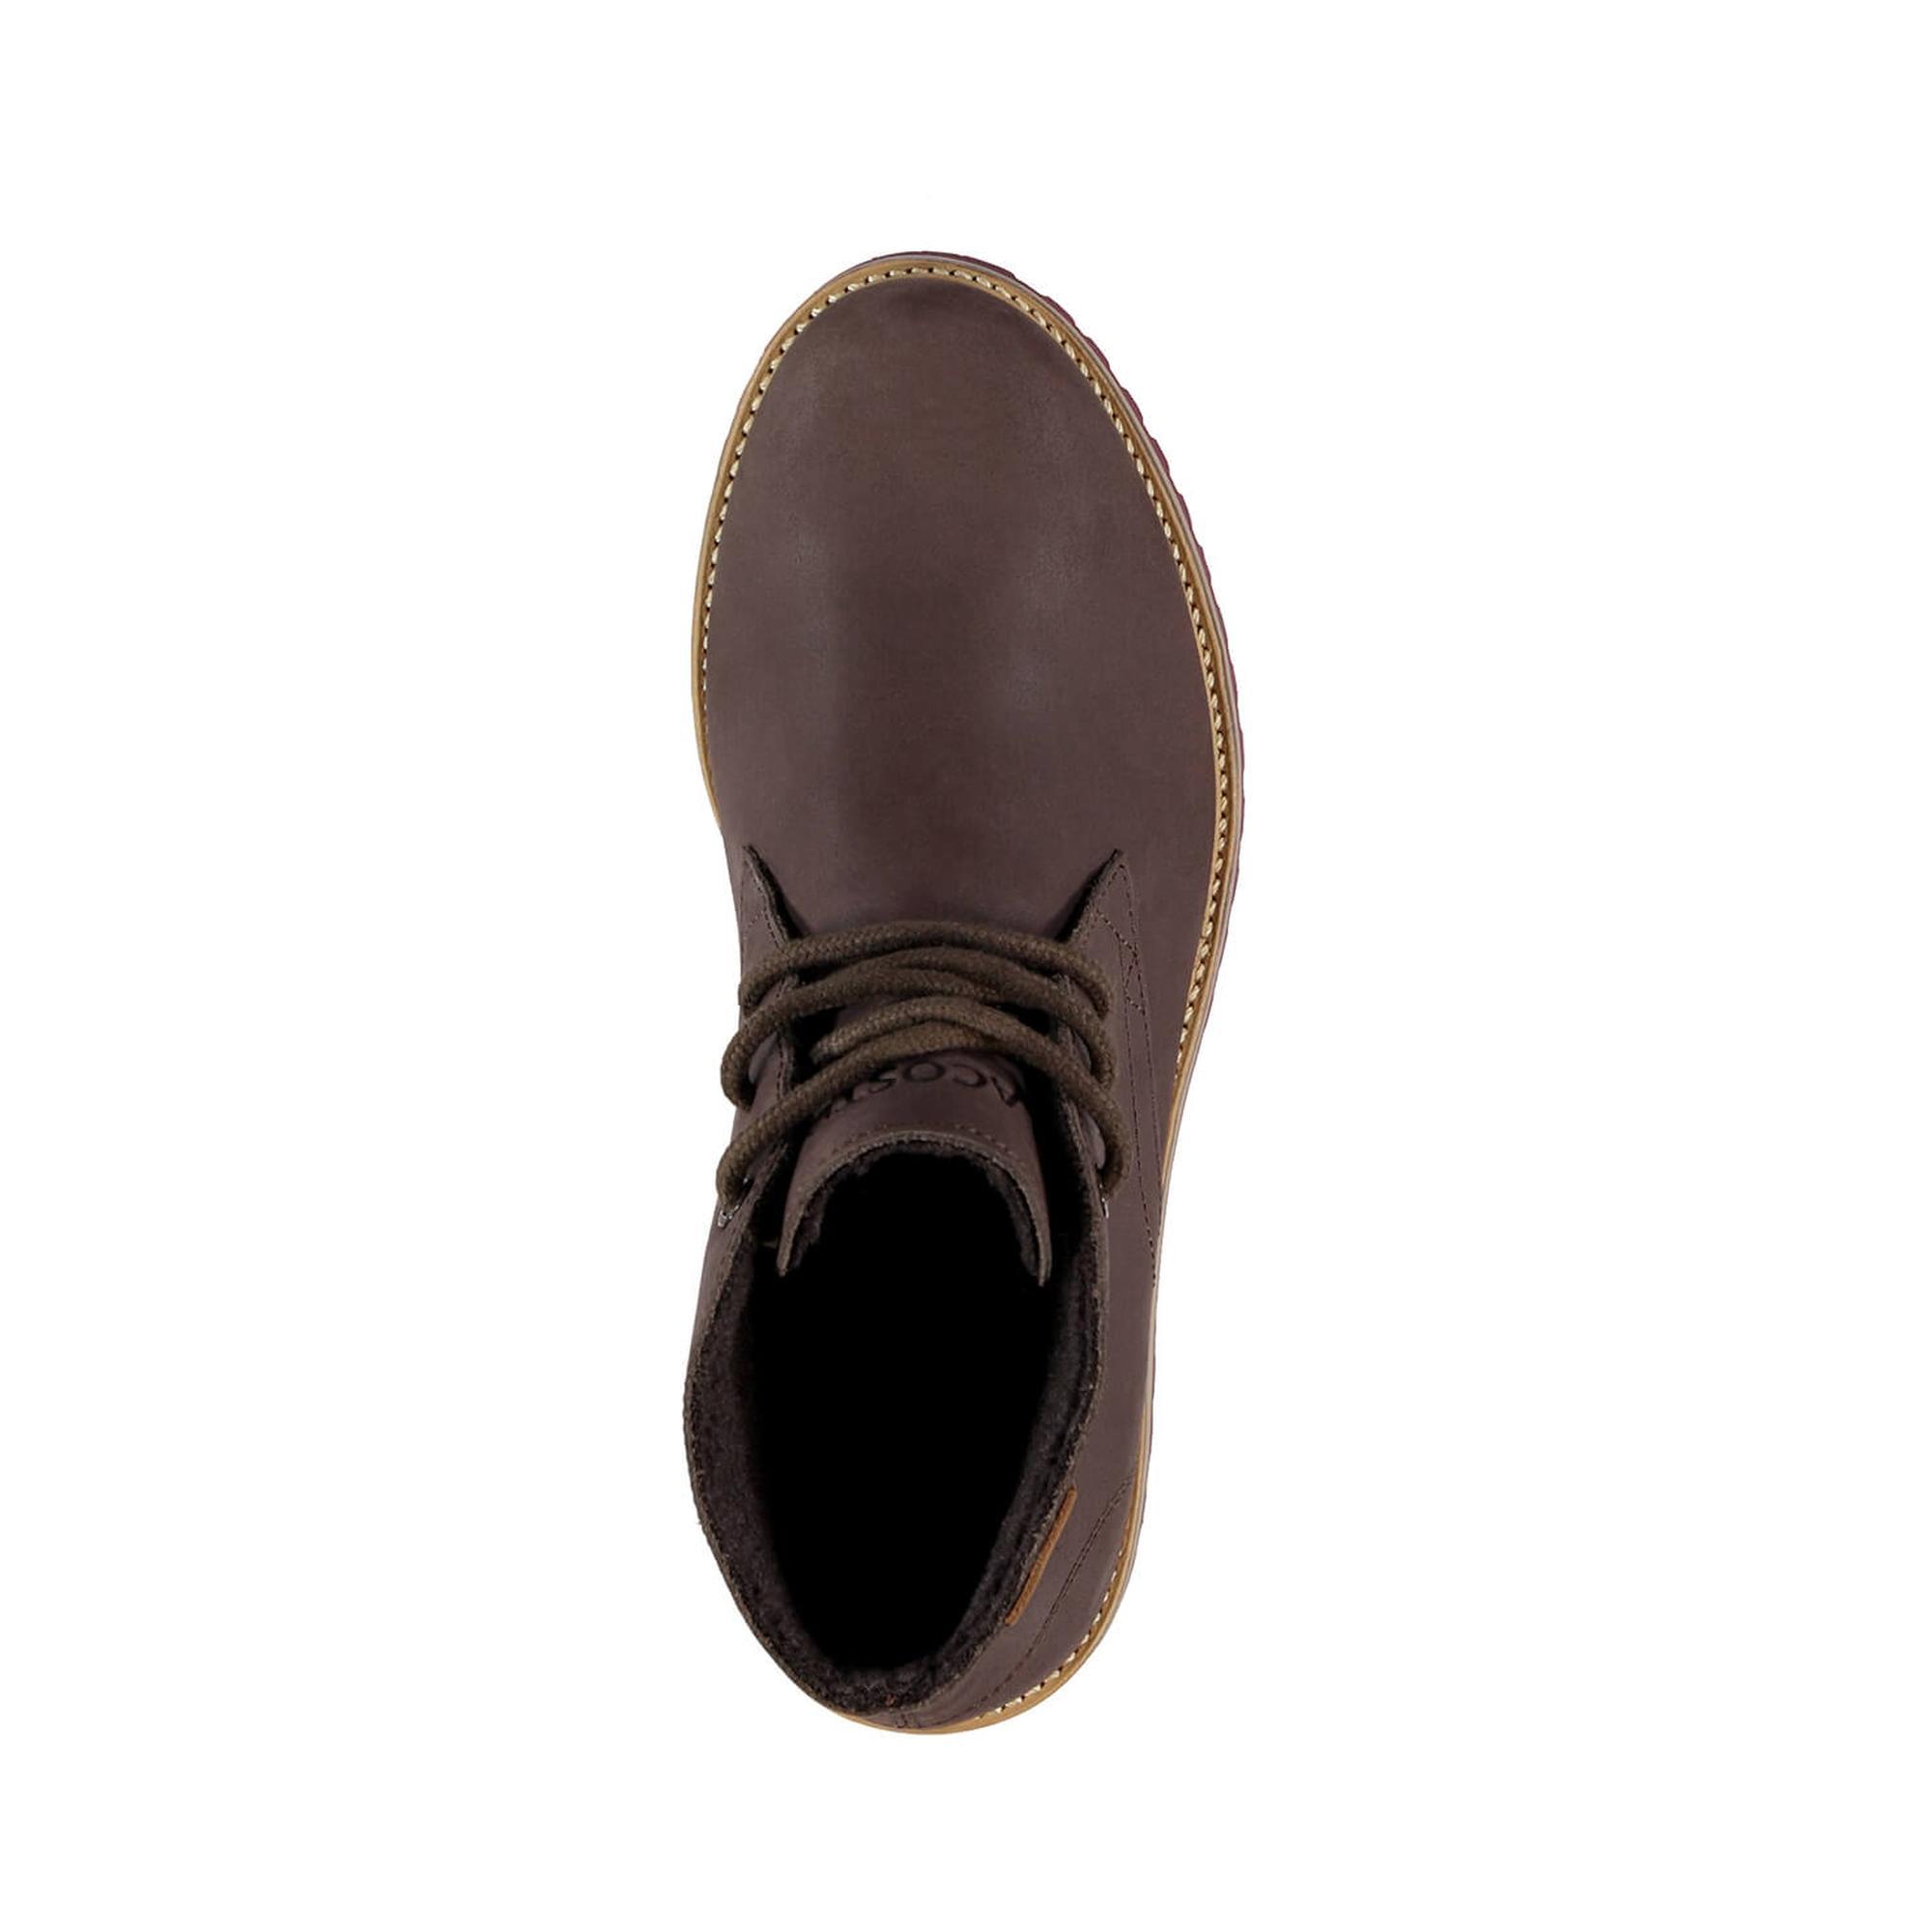 Lacoste черевики жіночі Manette